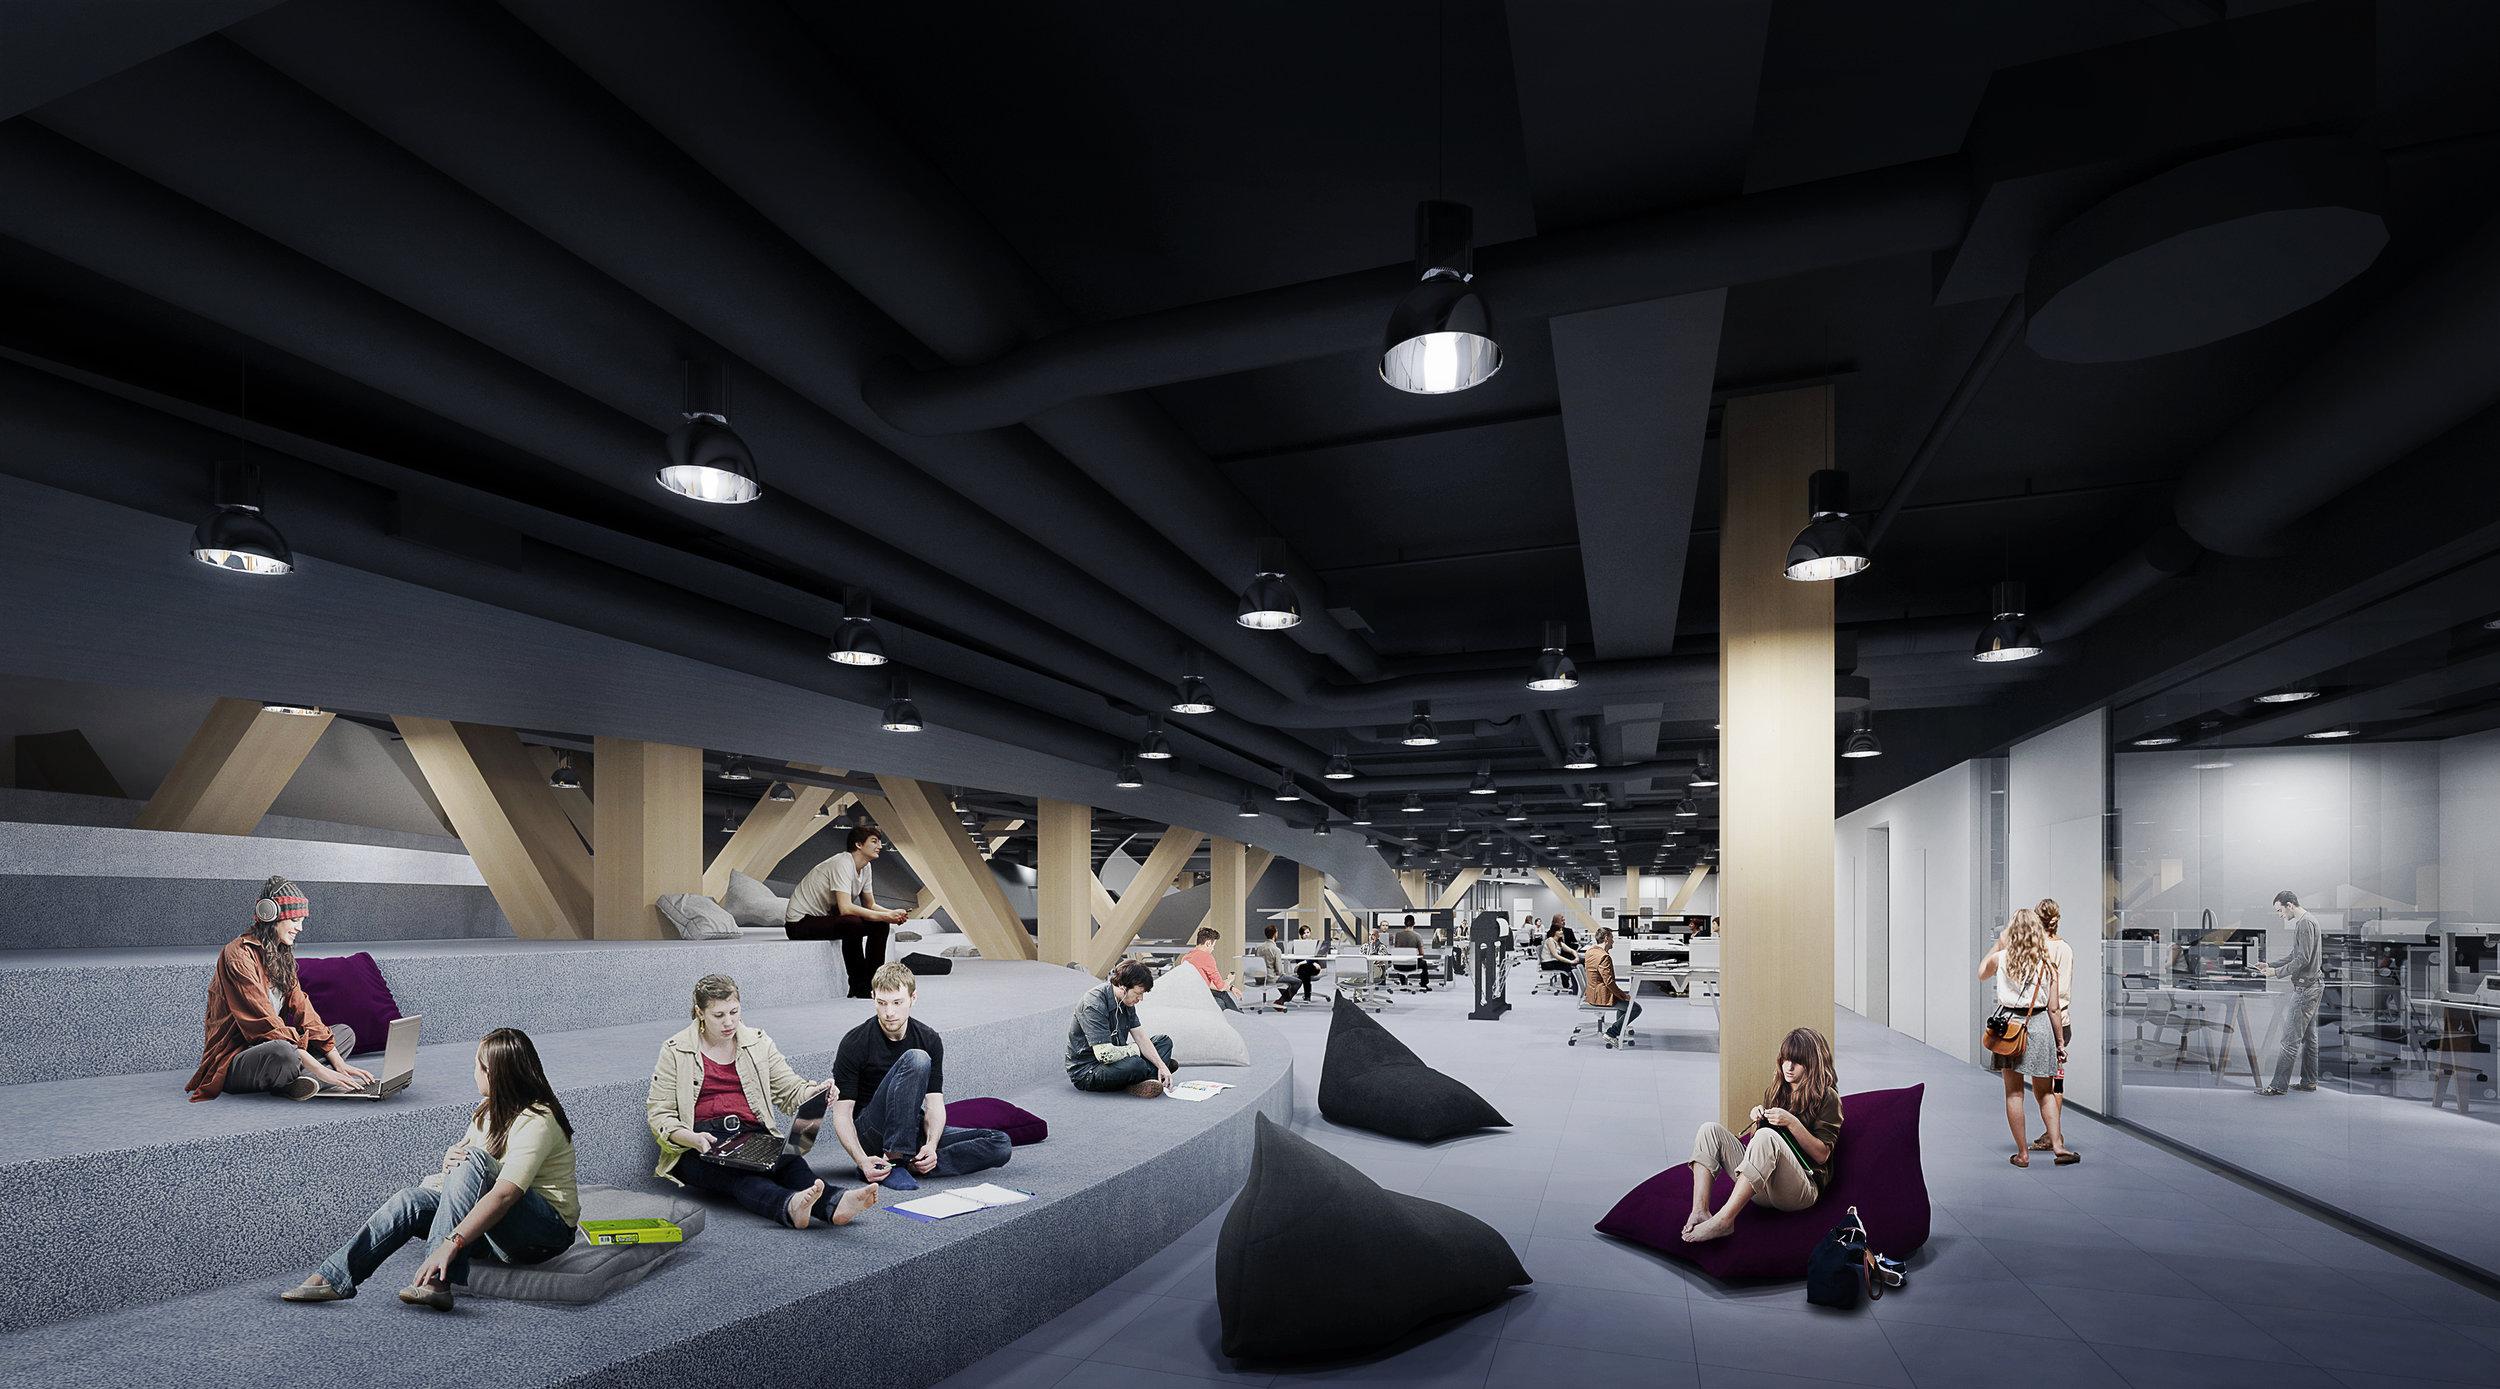 Helsinki Central Library by ALA - 1st floor interior 2016.jpg